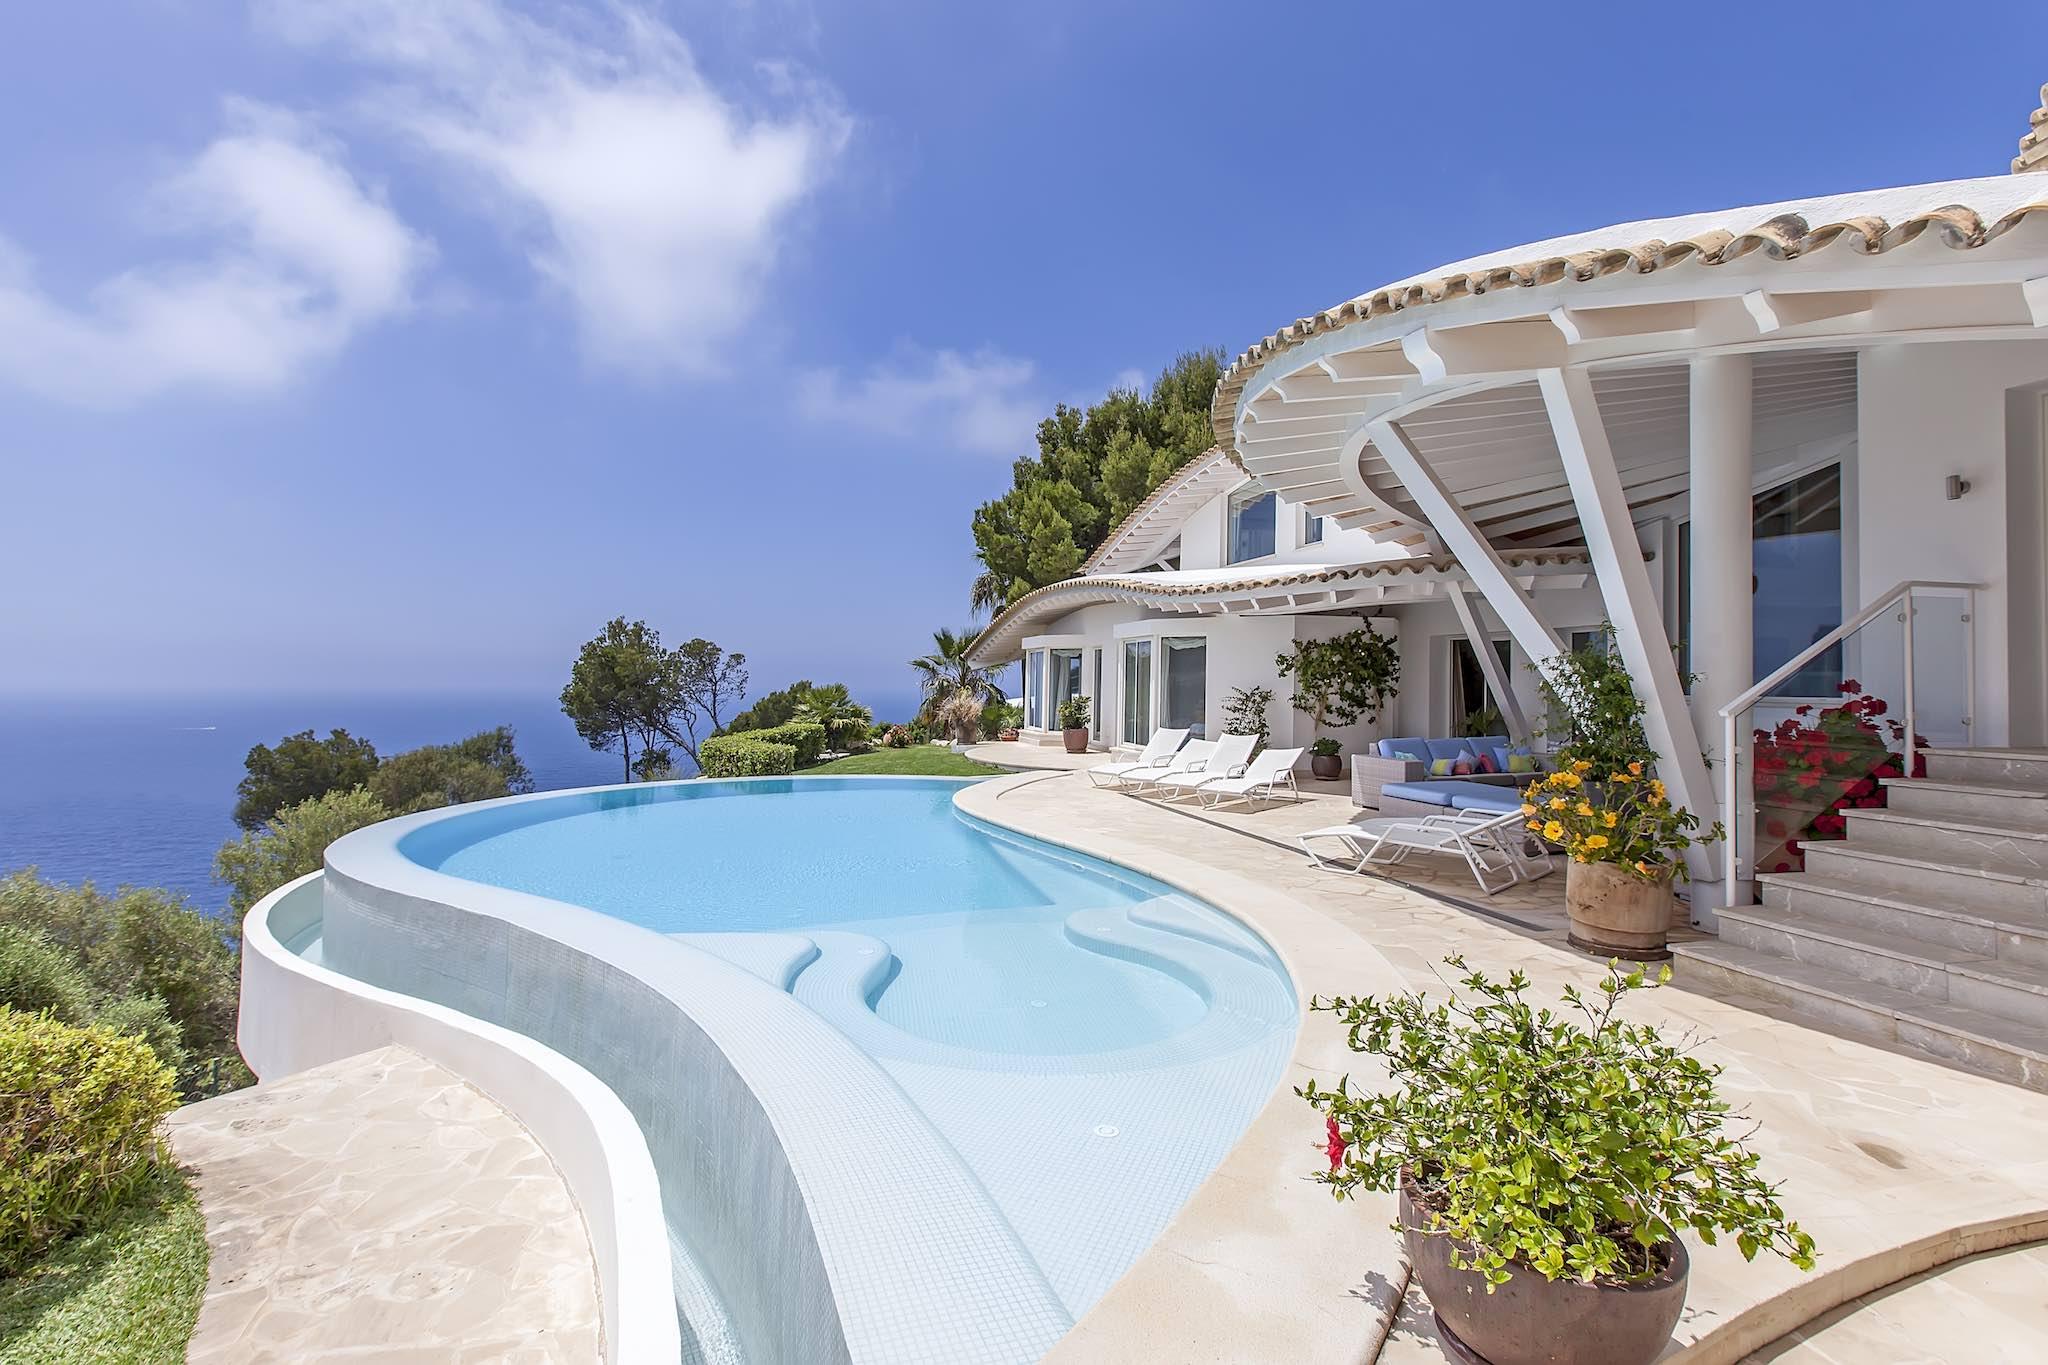 Engel & Völkers villa for sale overlooking Puerto Andratx and the sea. €8.9m